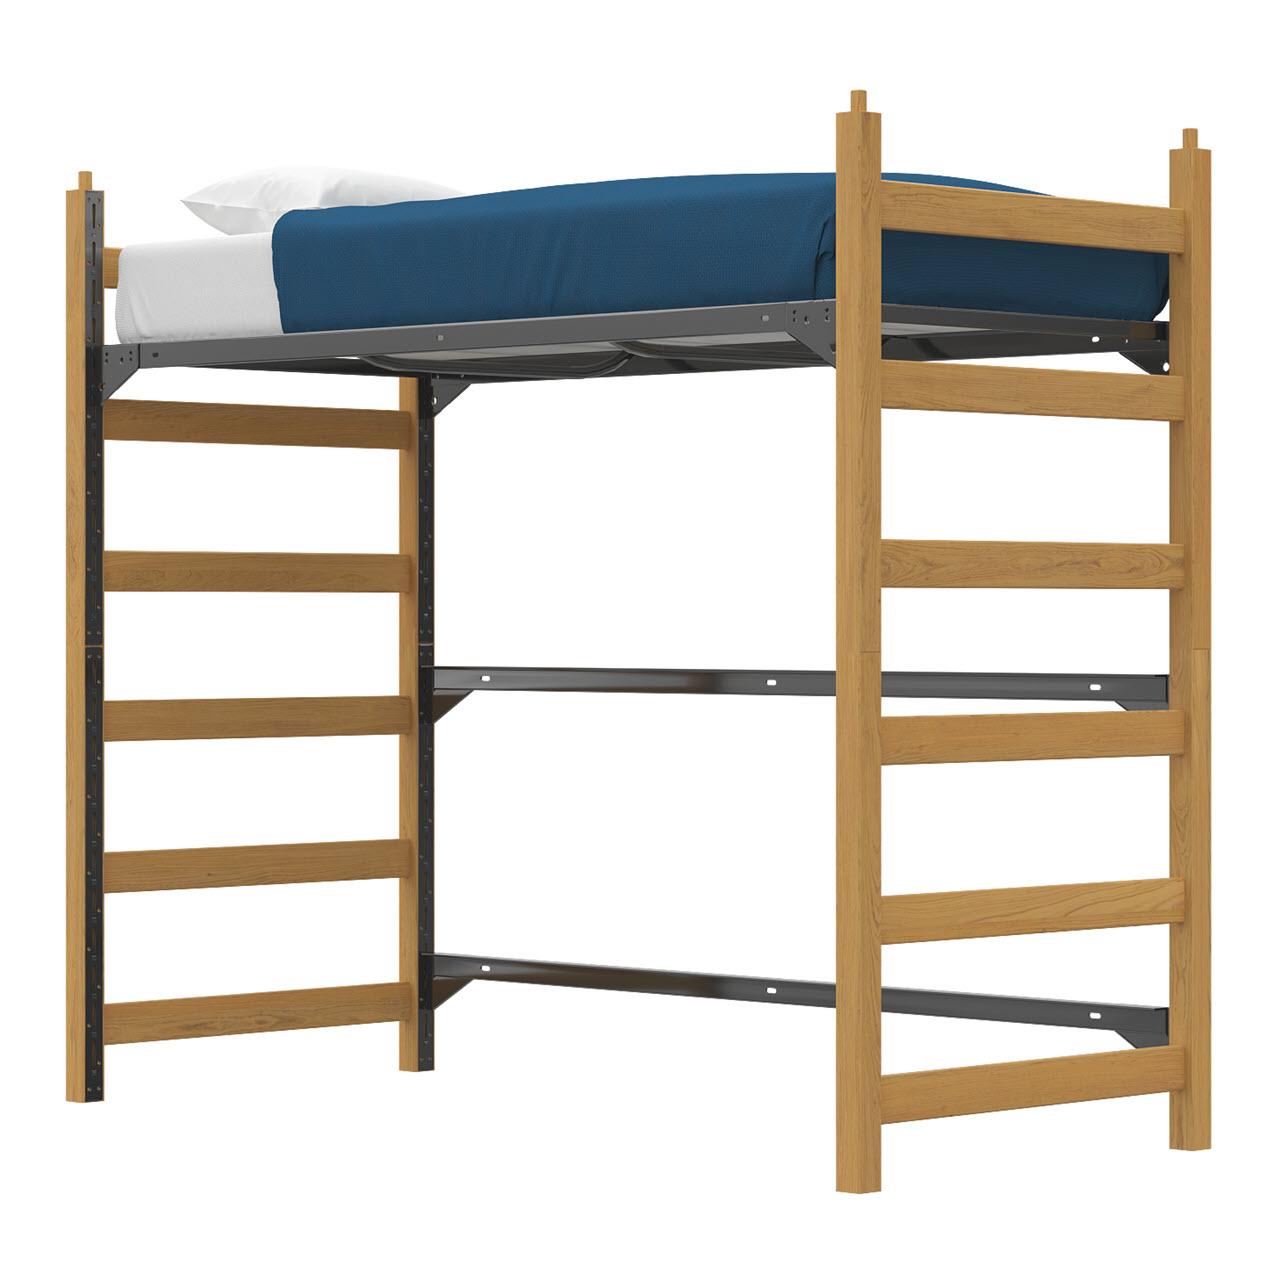 Bed | High Loft | Track Lock